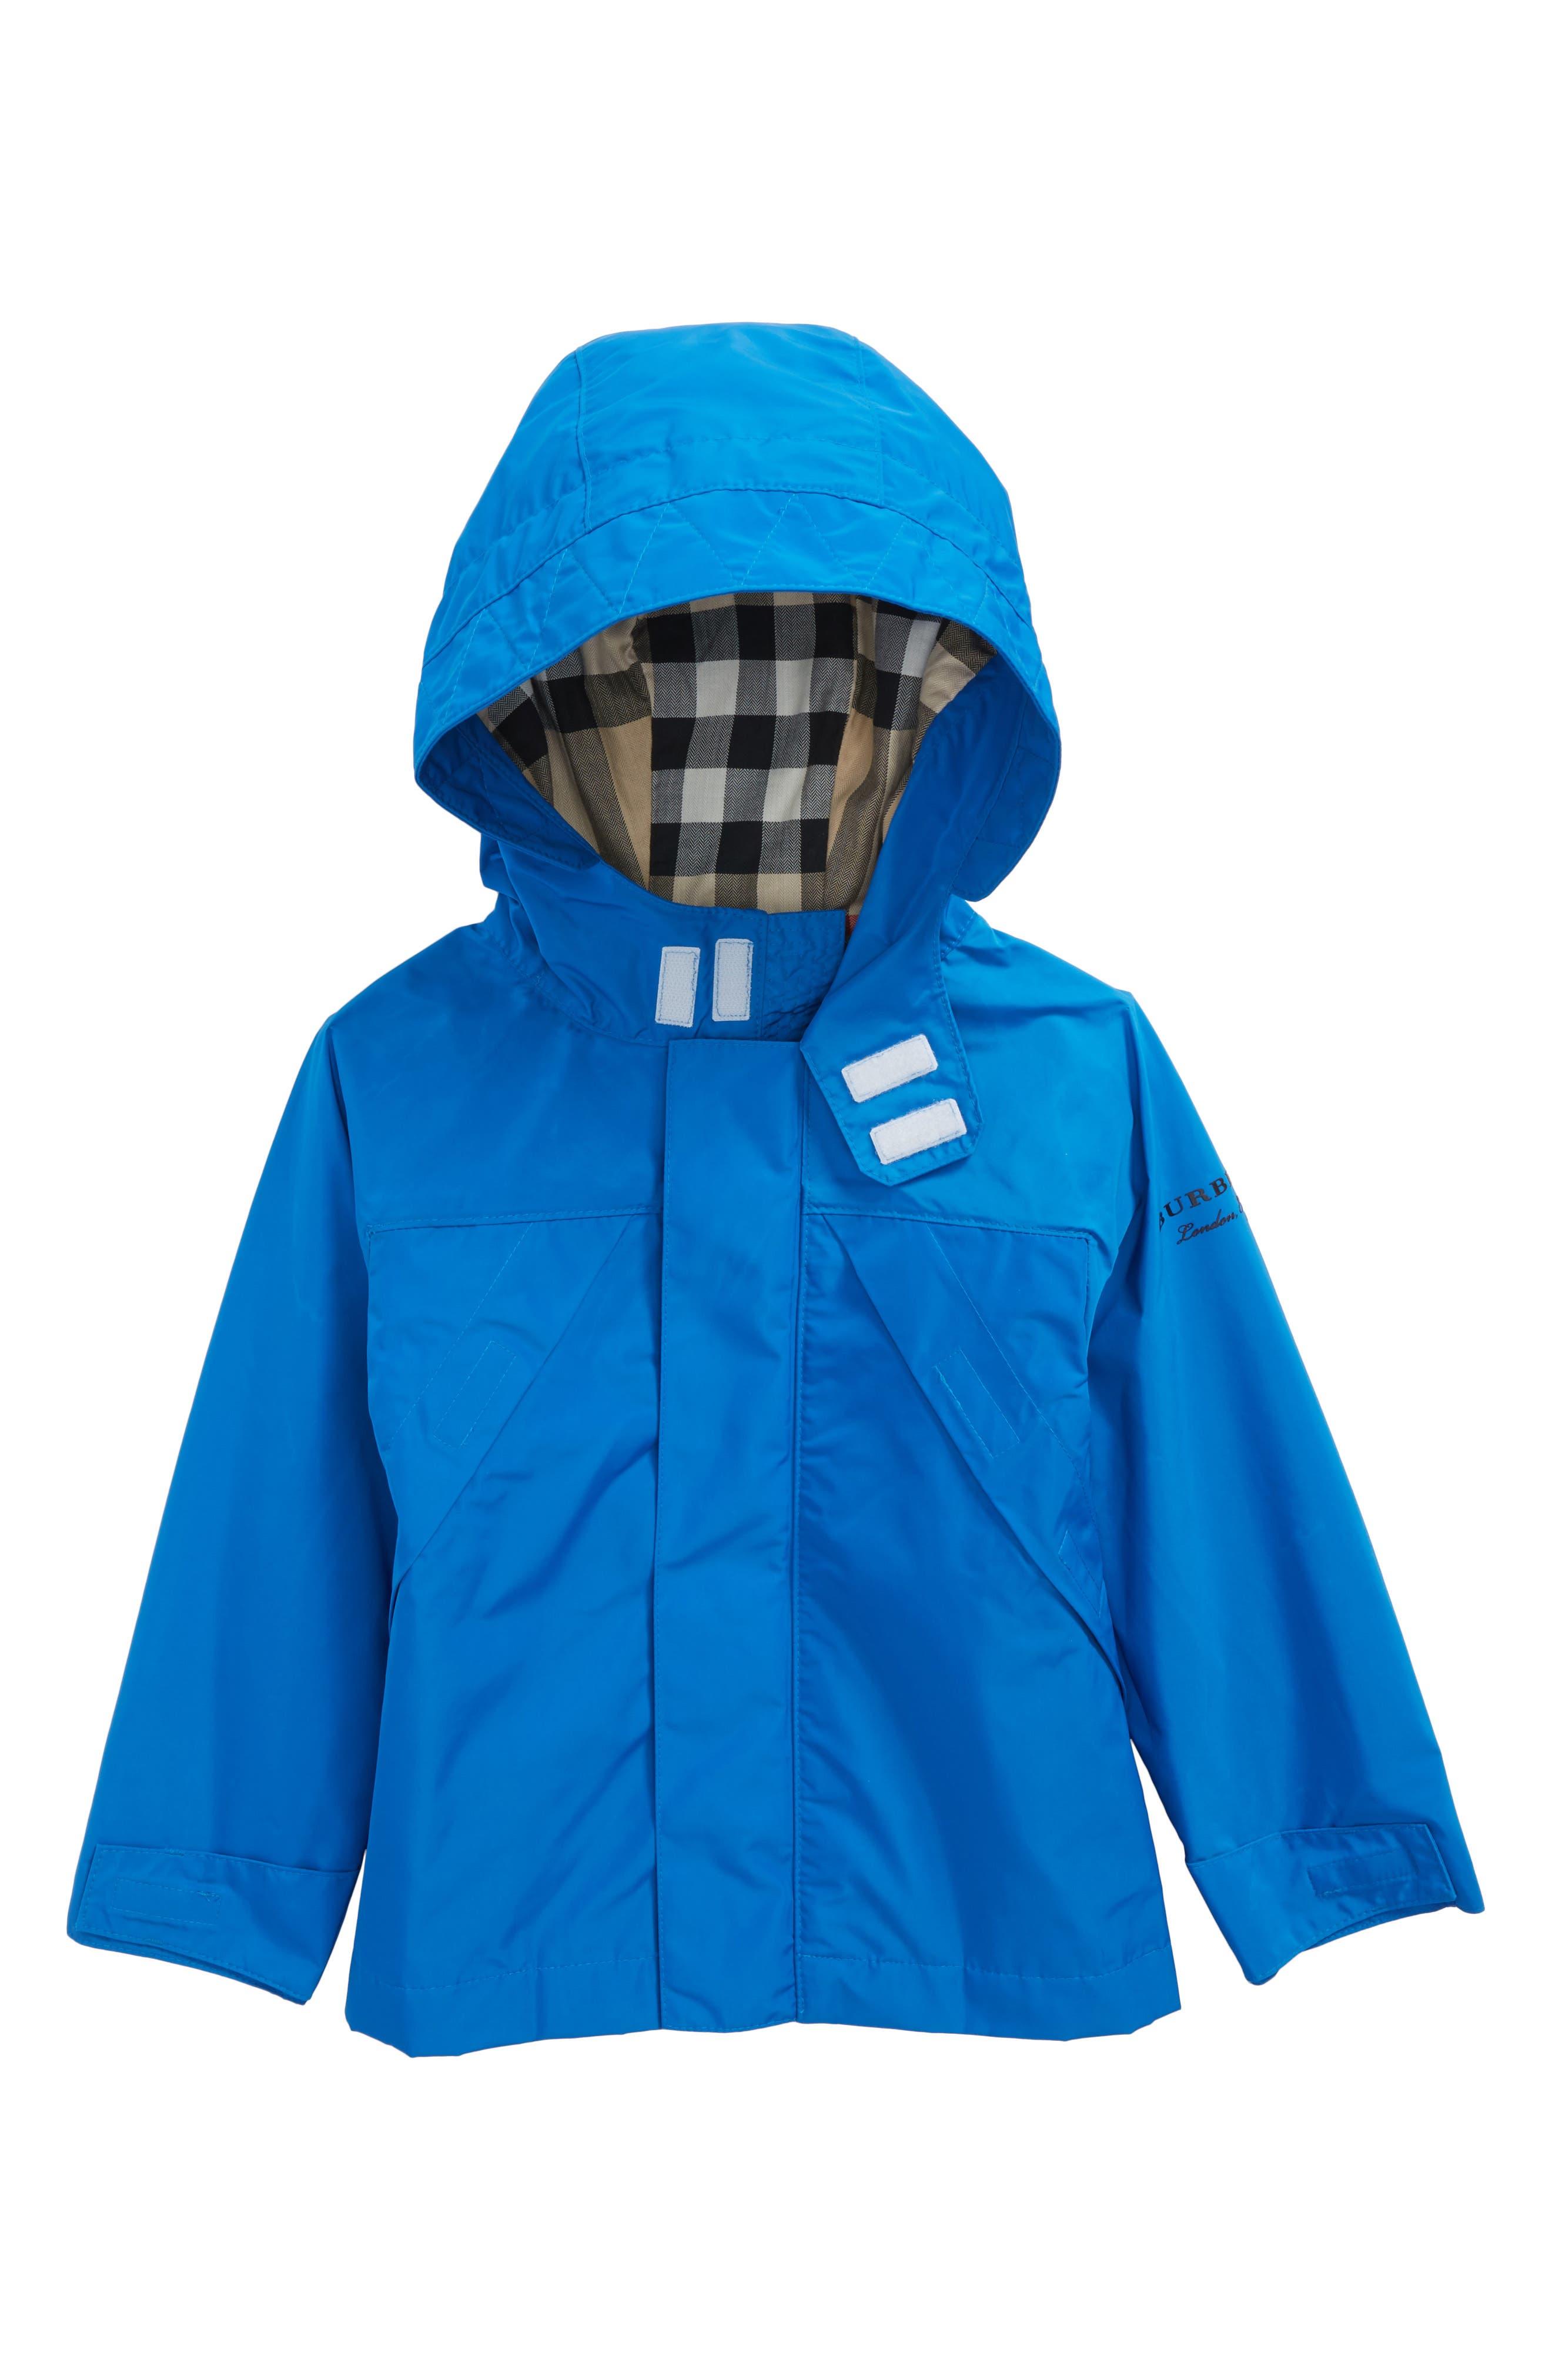 Yeoman Hooded Taffeta Windbreaker Jacket,                         Main,                         color, 420